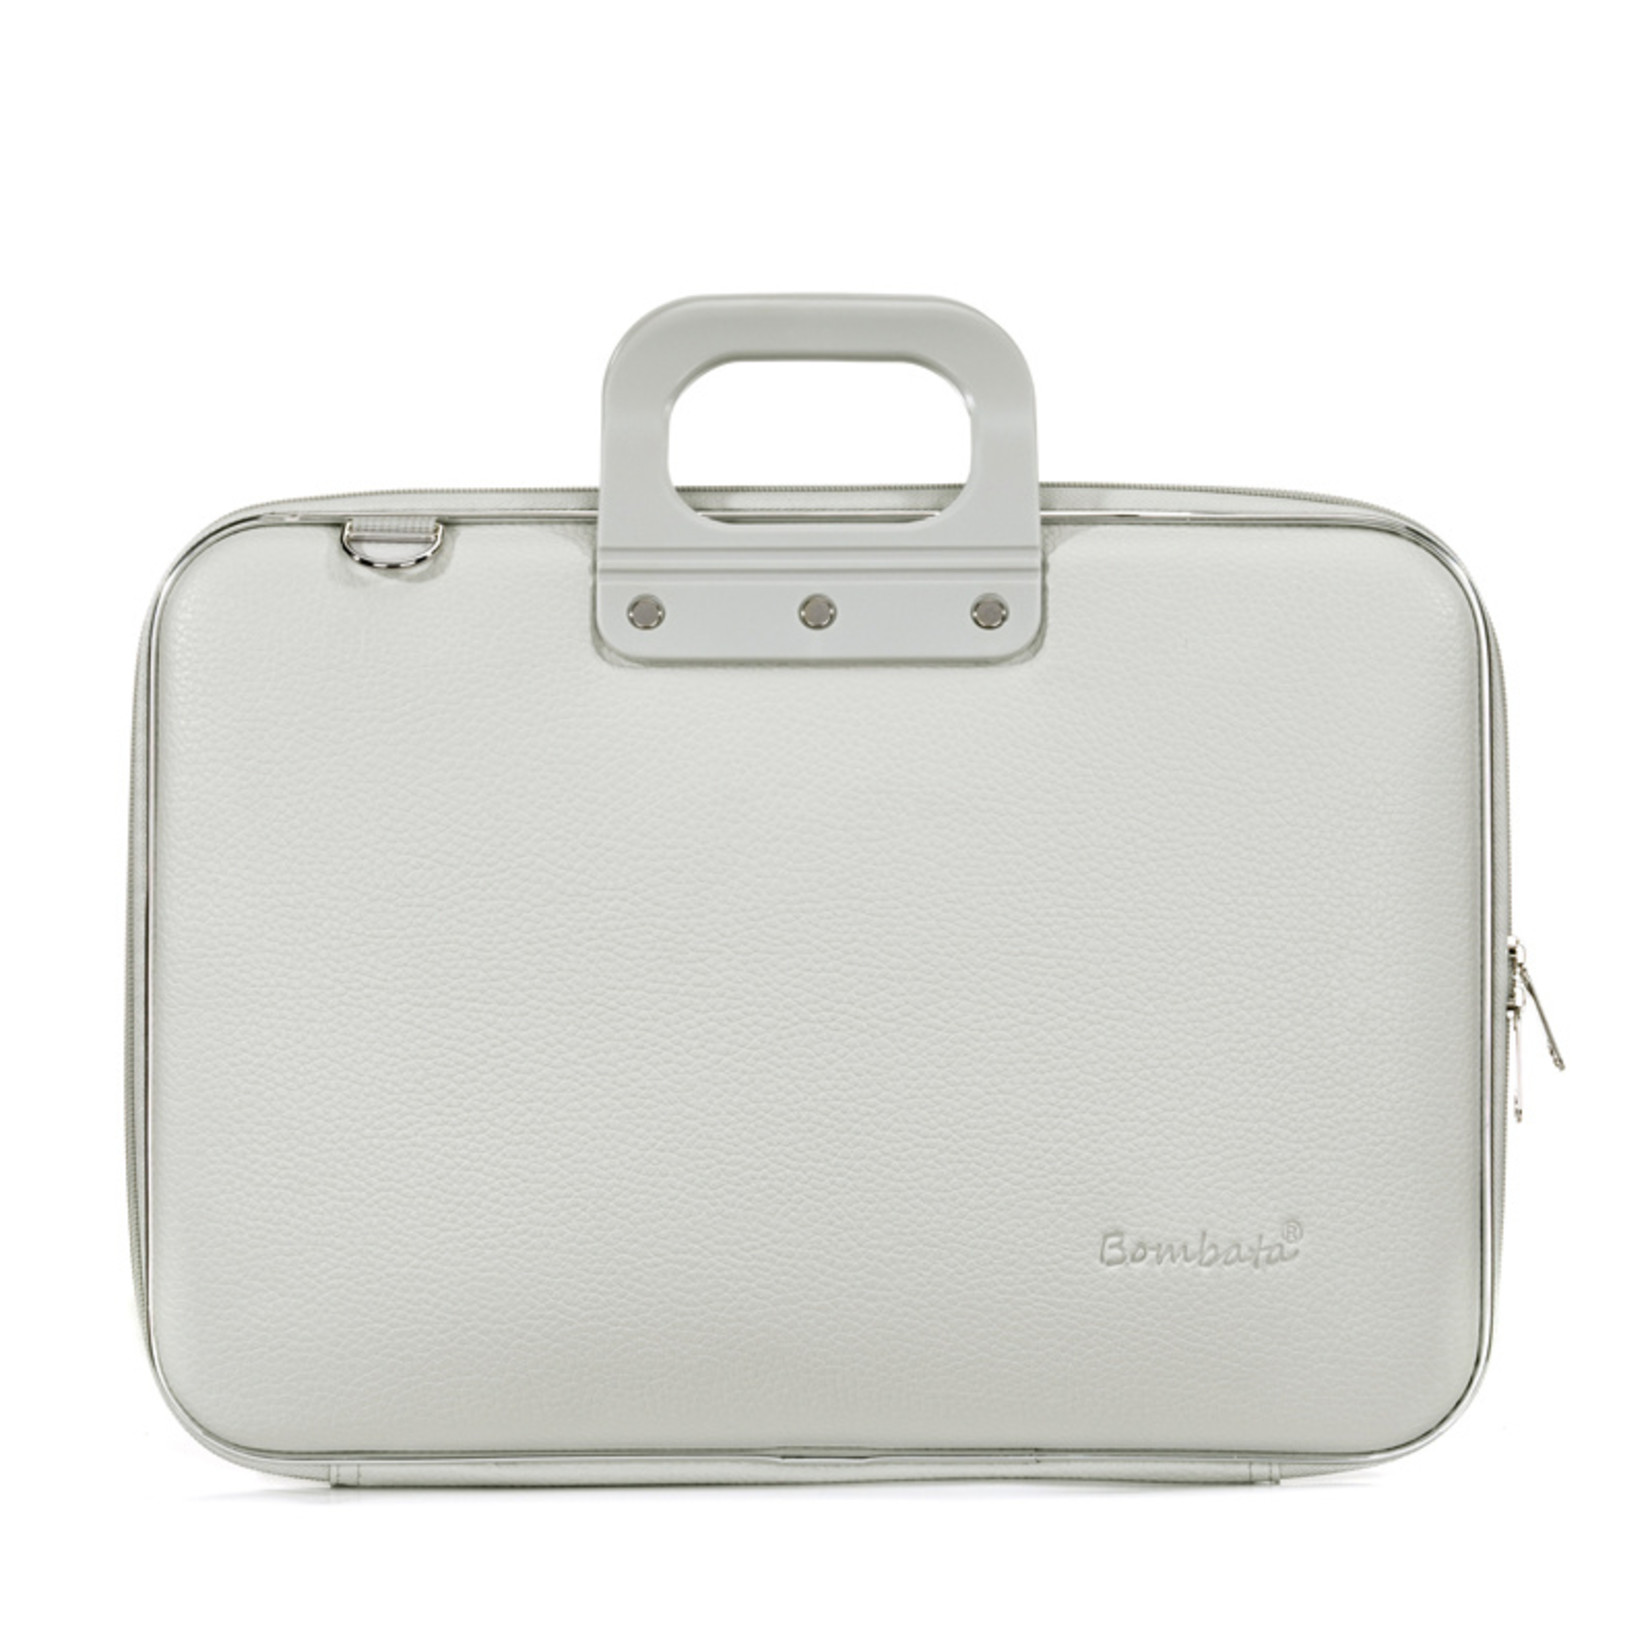 "Bombata Taschen Laptoptasche 15,6"" | Bombata Classic | Notebooktasche grau"